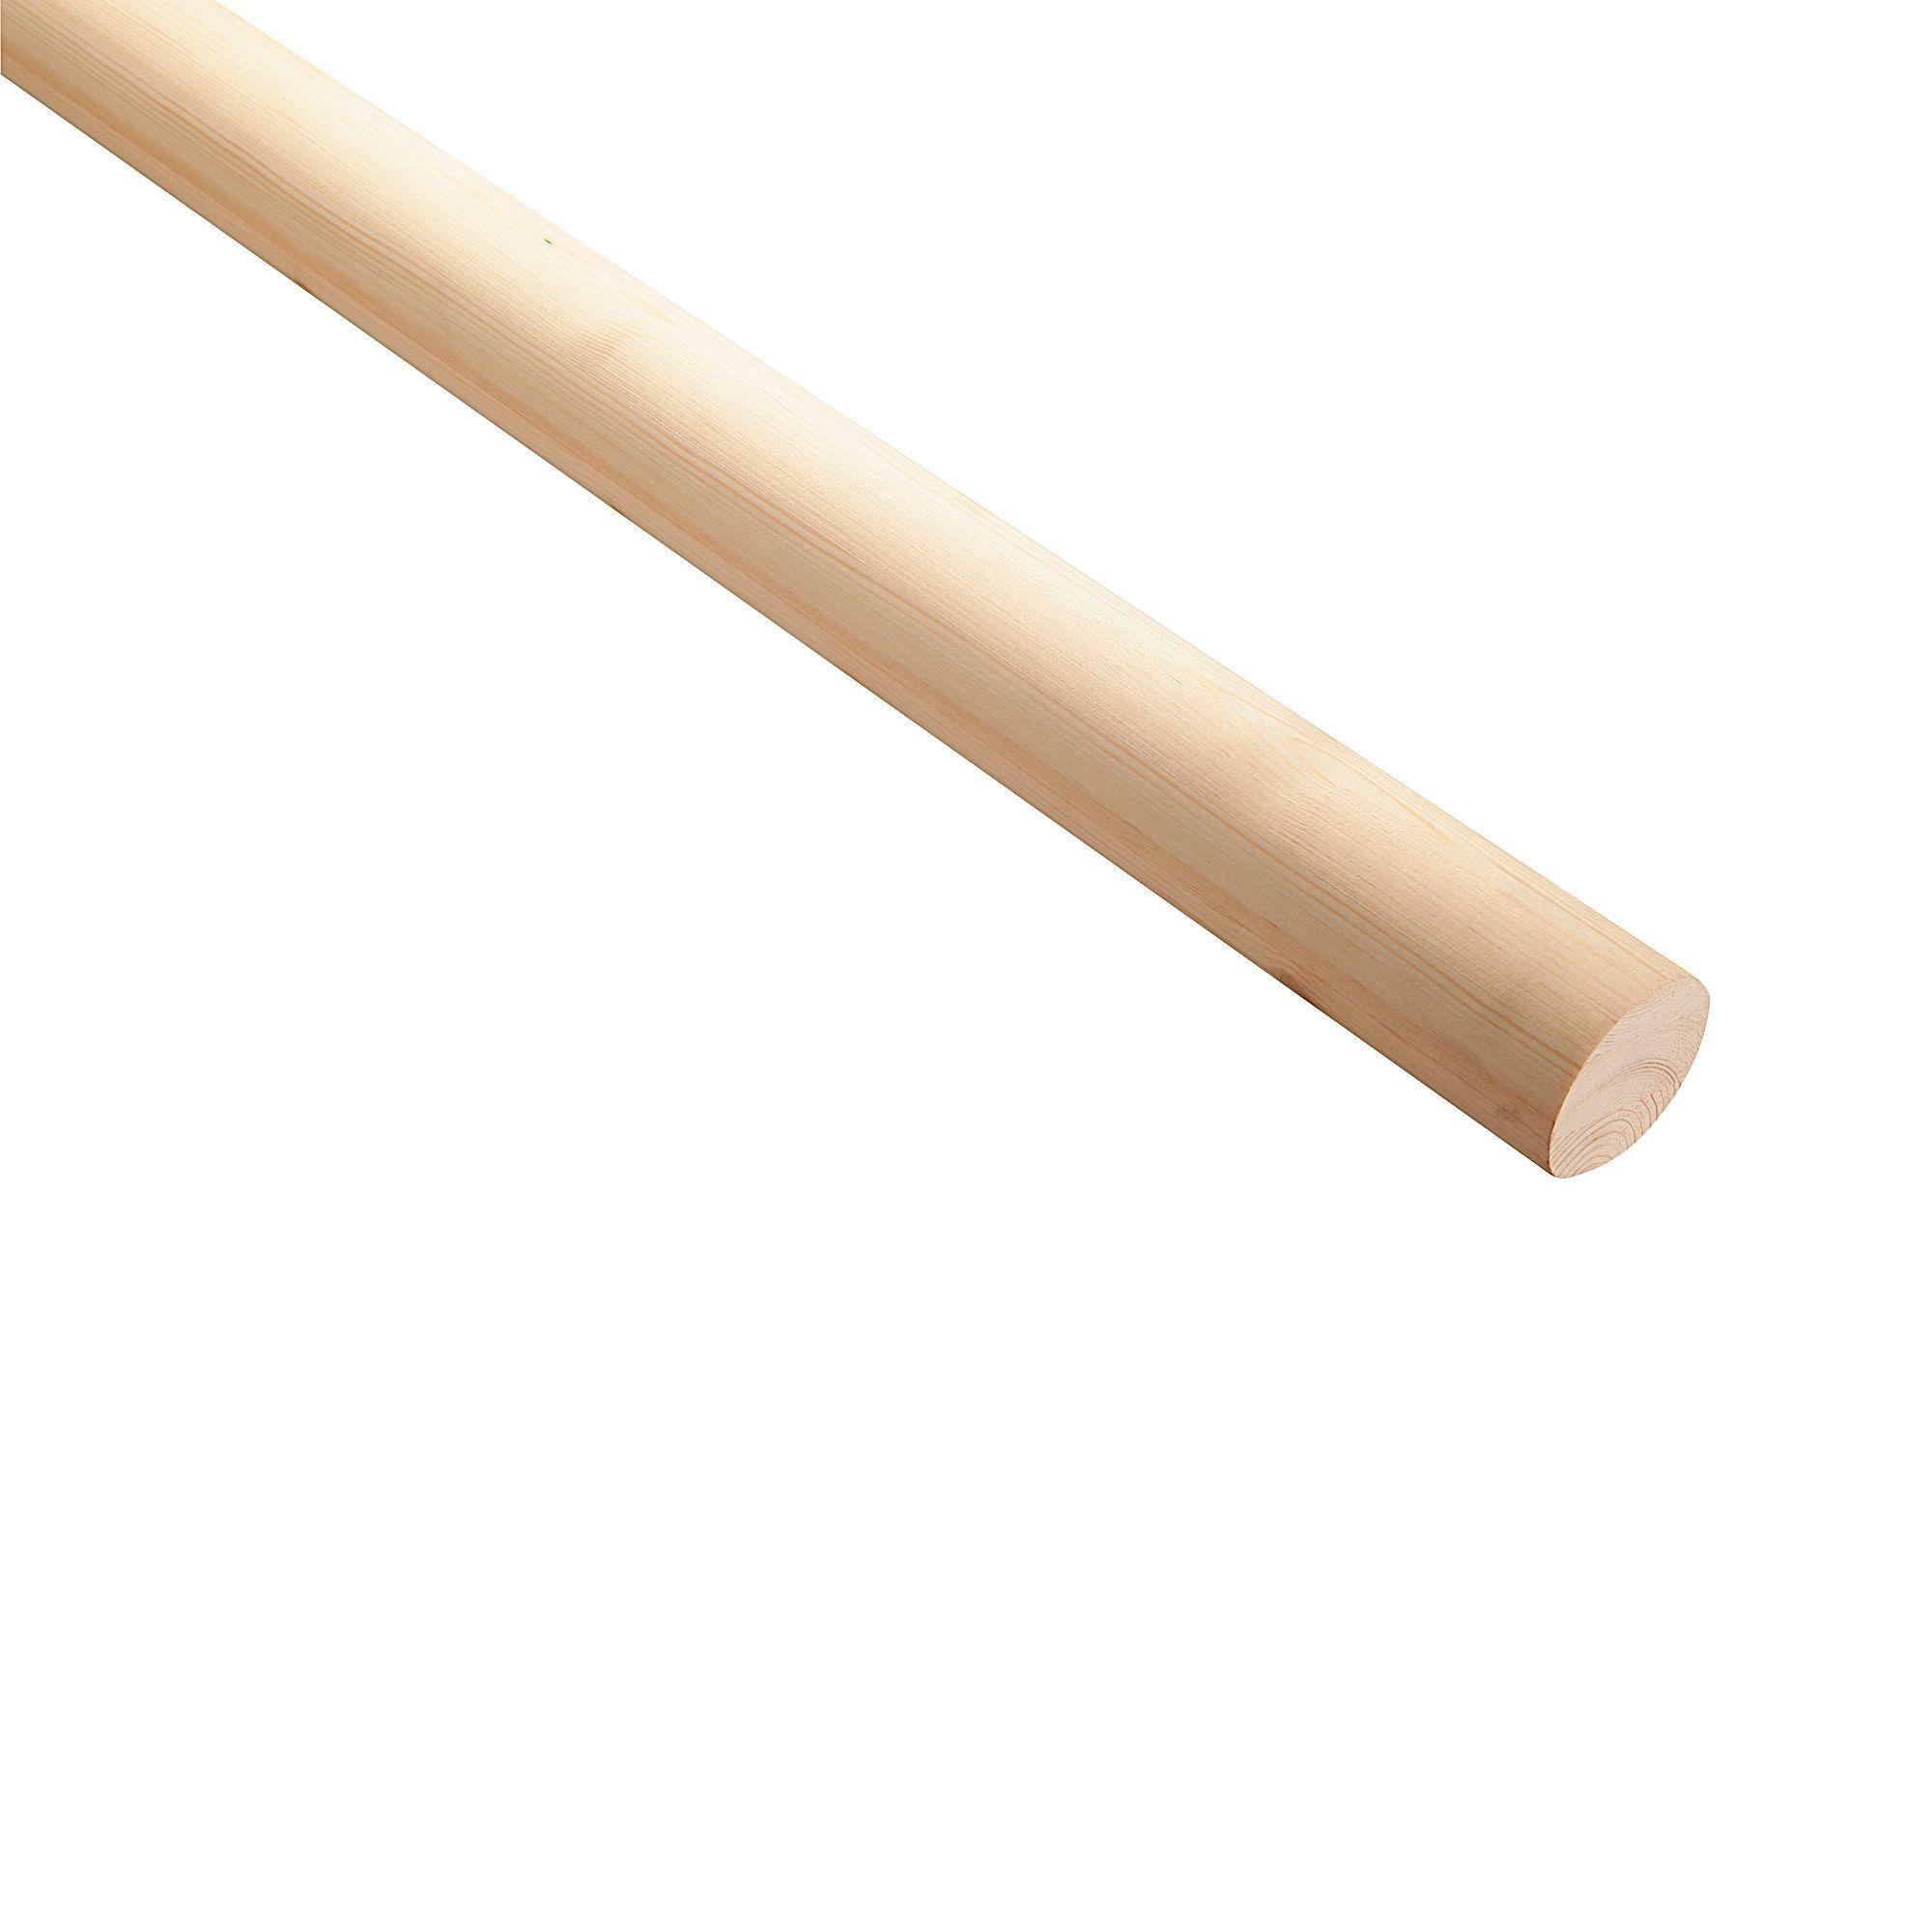 Best Pine Wall Mounted Handrail L 3600Mm Departments Diy 400 x 300